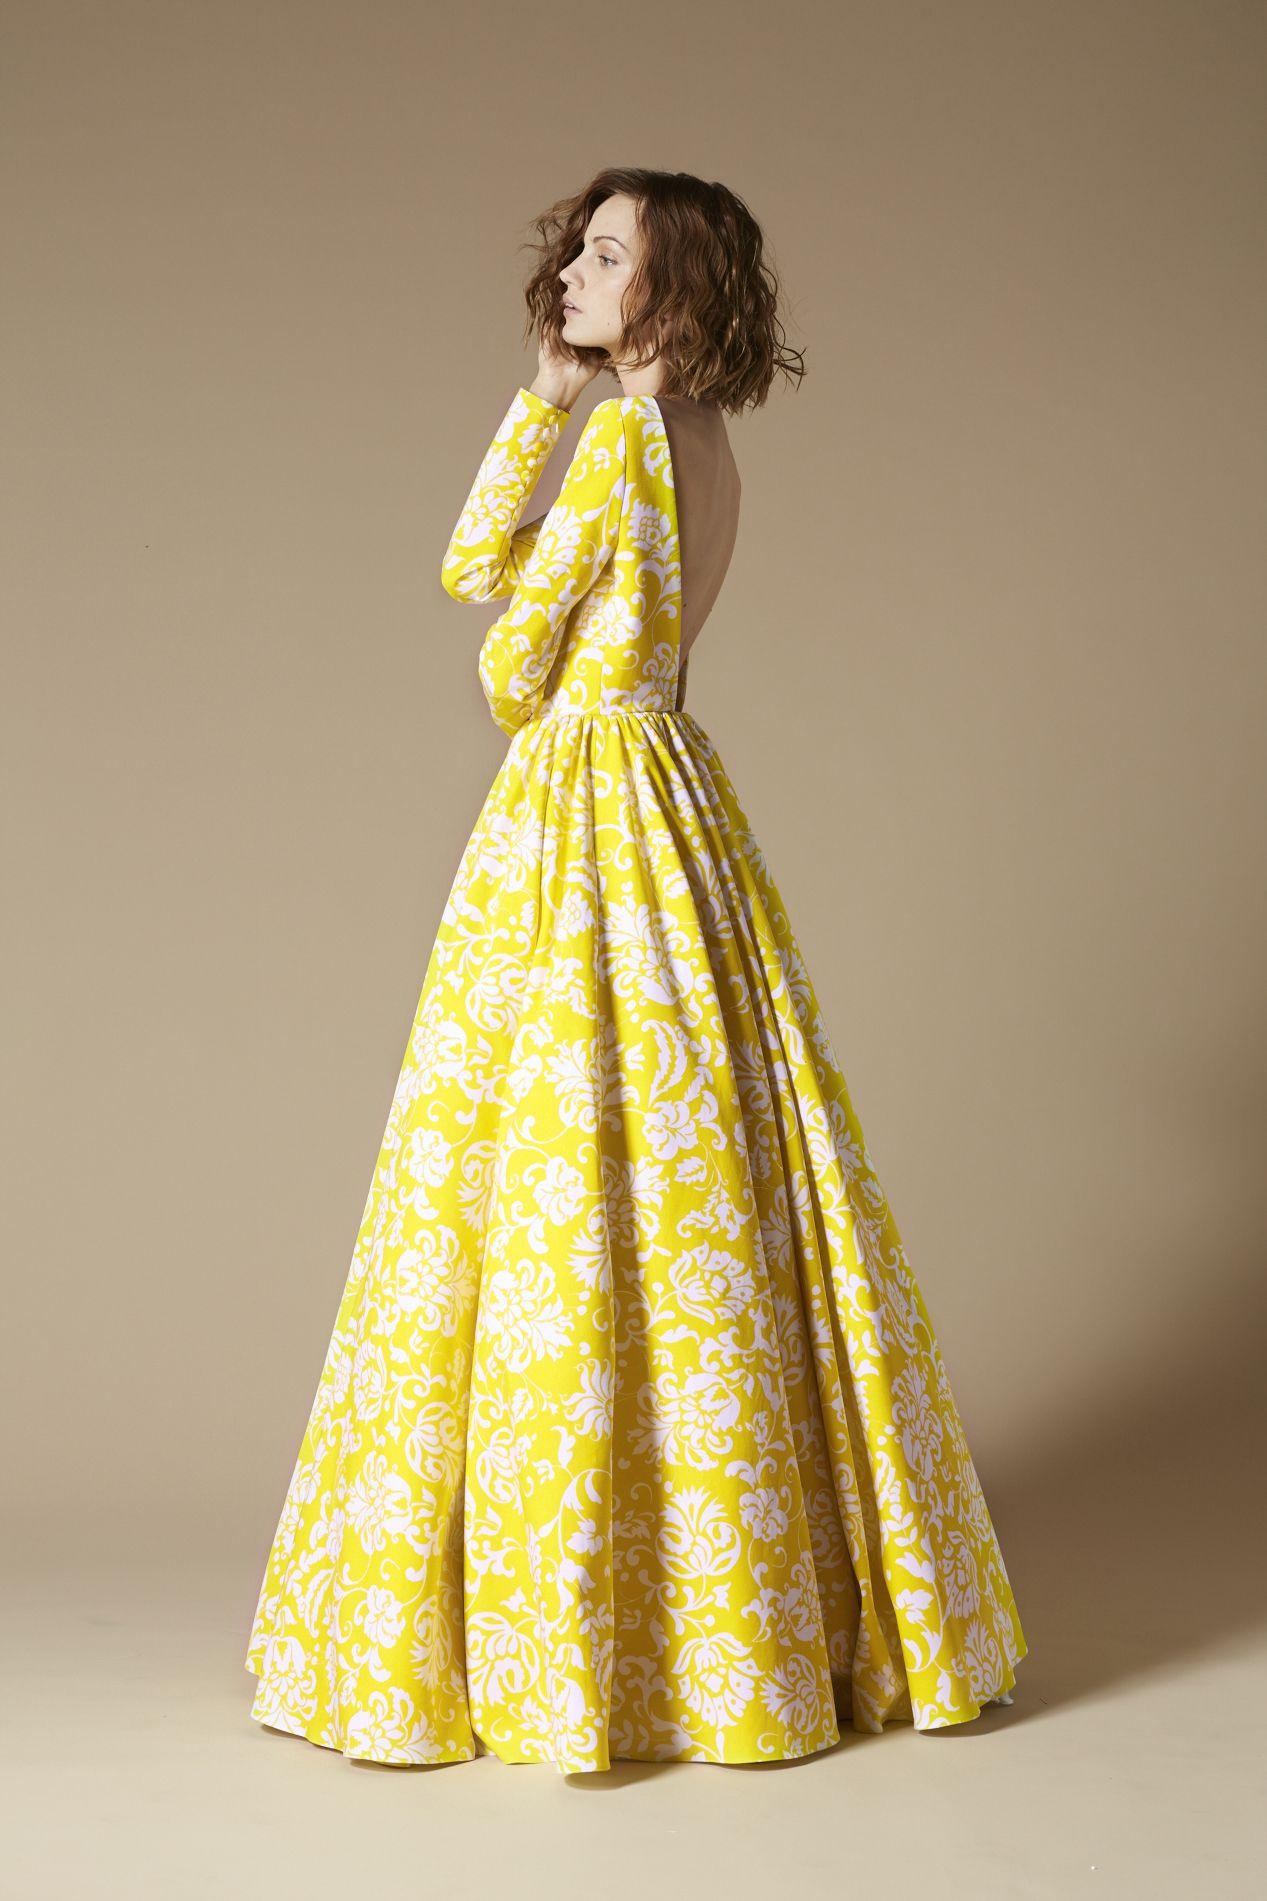 morpho robe de mariage les mod les qui nous font r ver yellow dress bright yellow and gowns. Black Bedroom Furniture Sets. Home Design Ideas